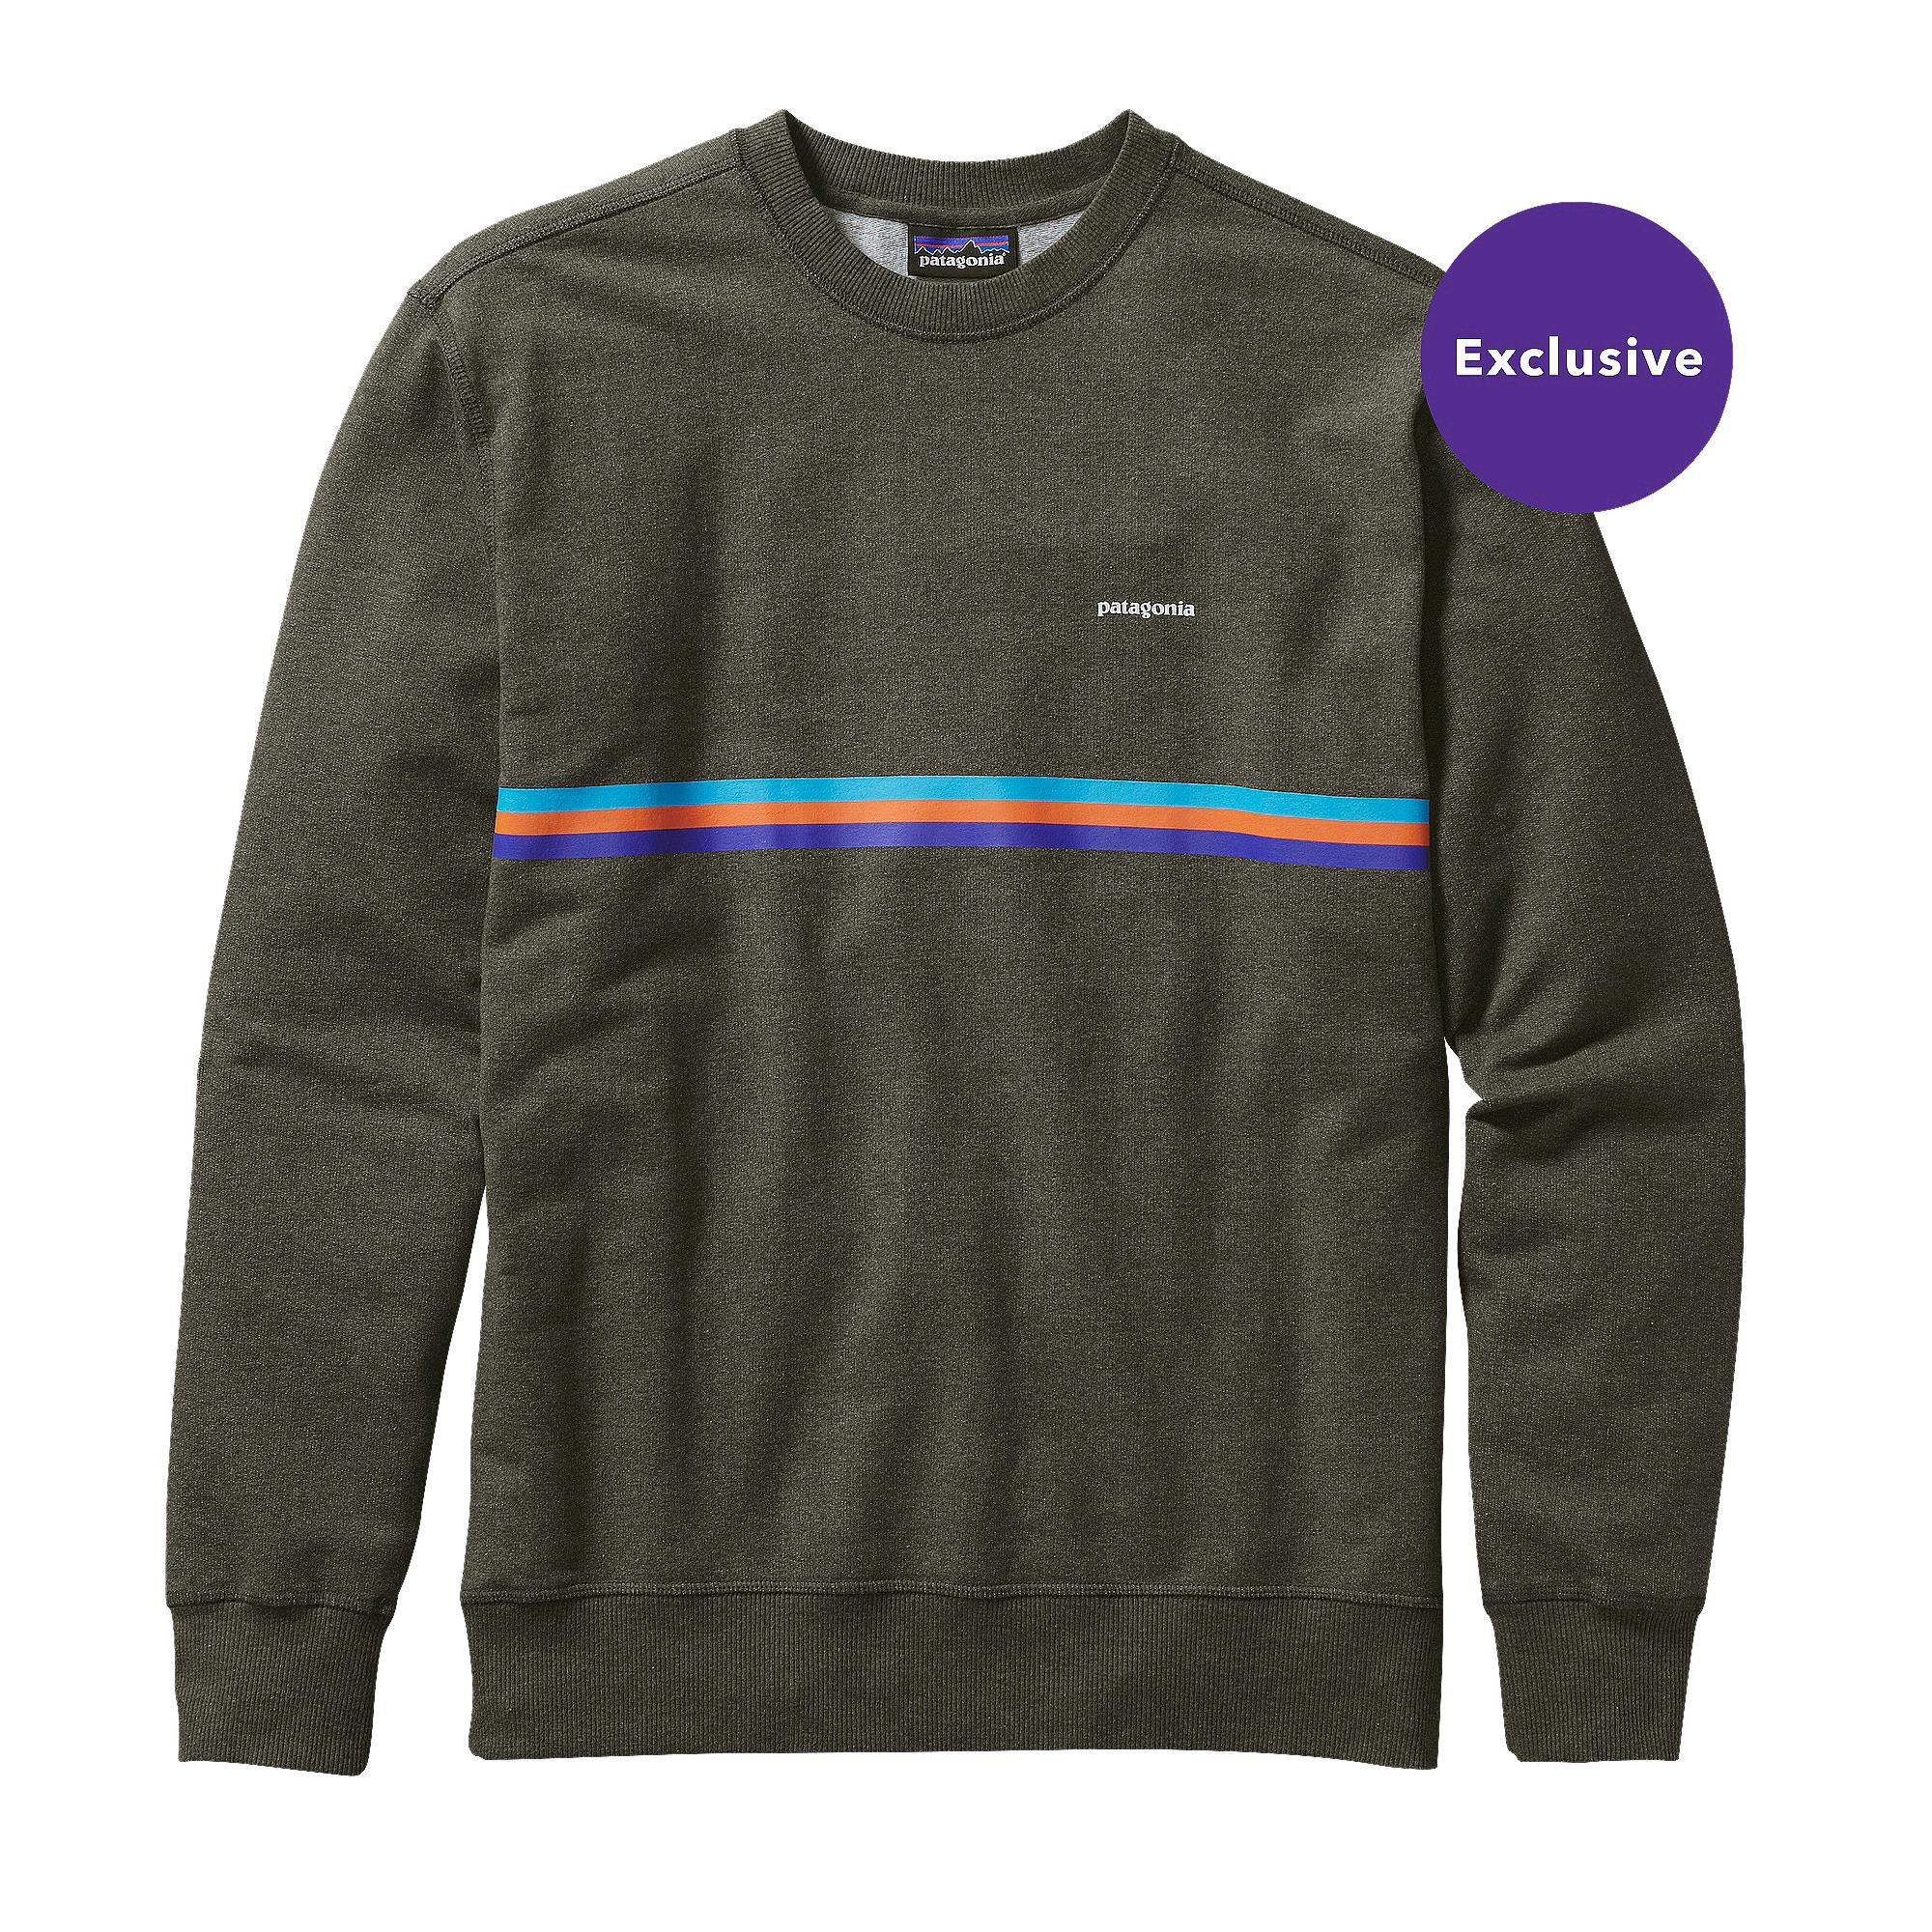 Patagonia Up Out Midweight Crew Sweatshirt Men S Beryl Green Long Sleeve Tshirt Men Sweatshirts Formal Men Outfit [ 900 x 900 Pixel ]